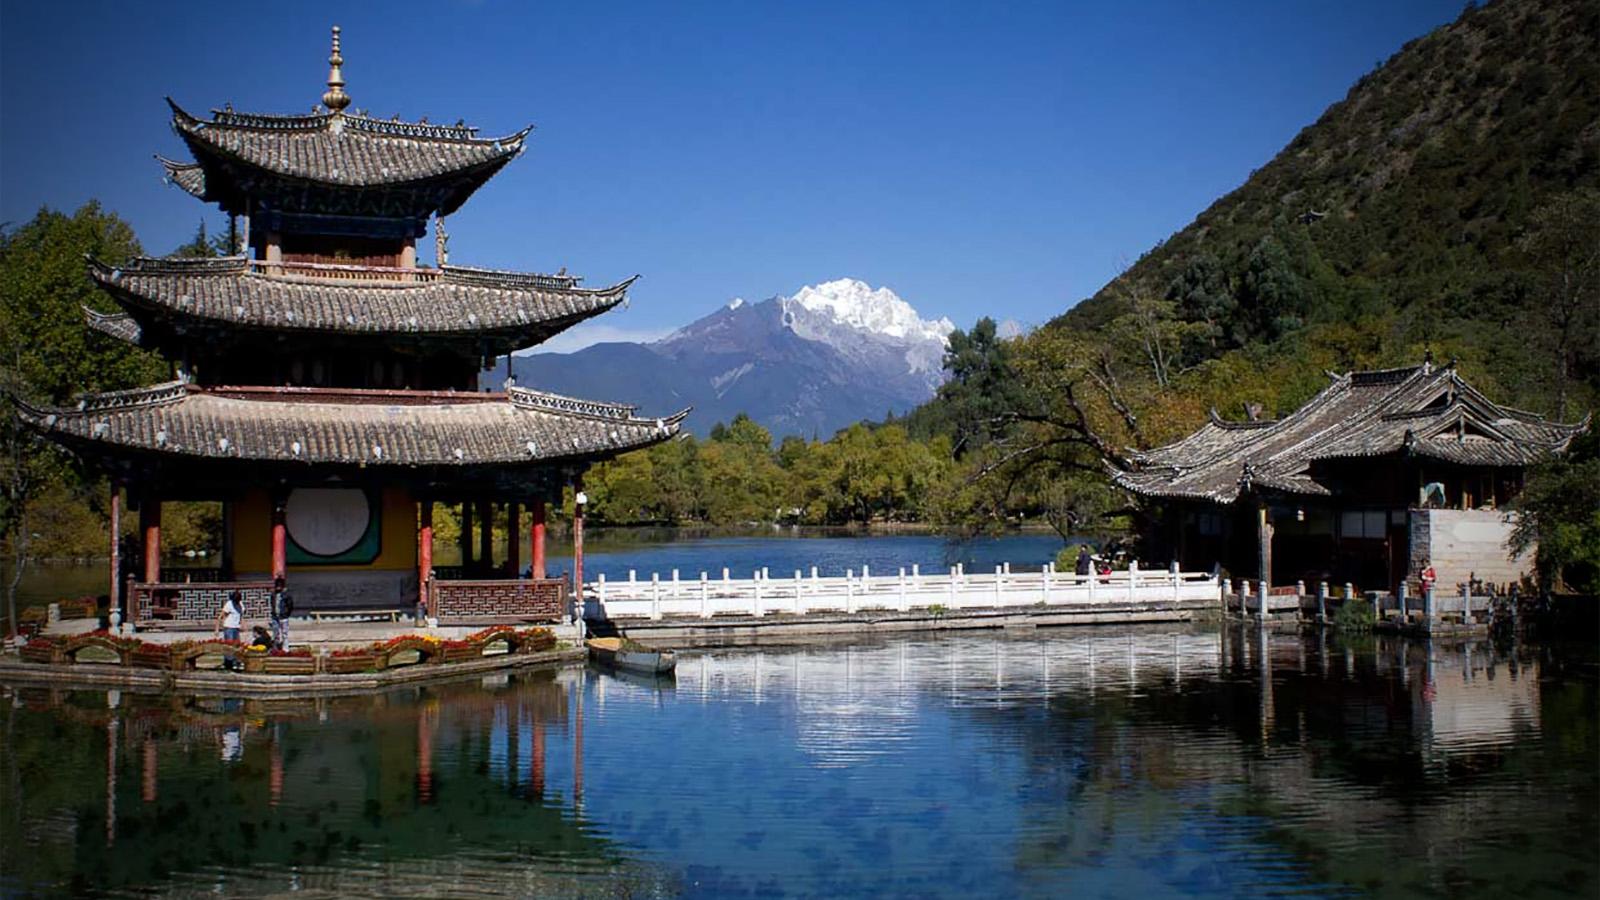 image courtesy www.chinatour.com